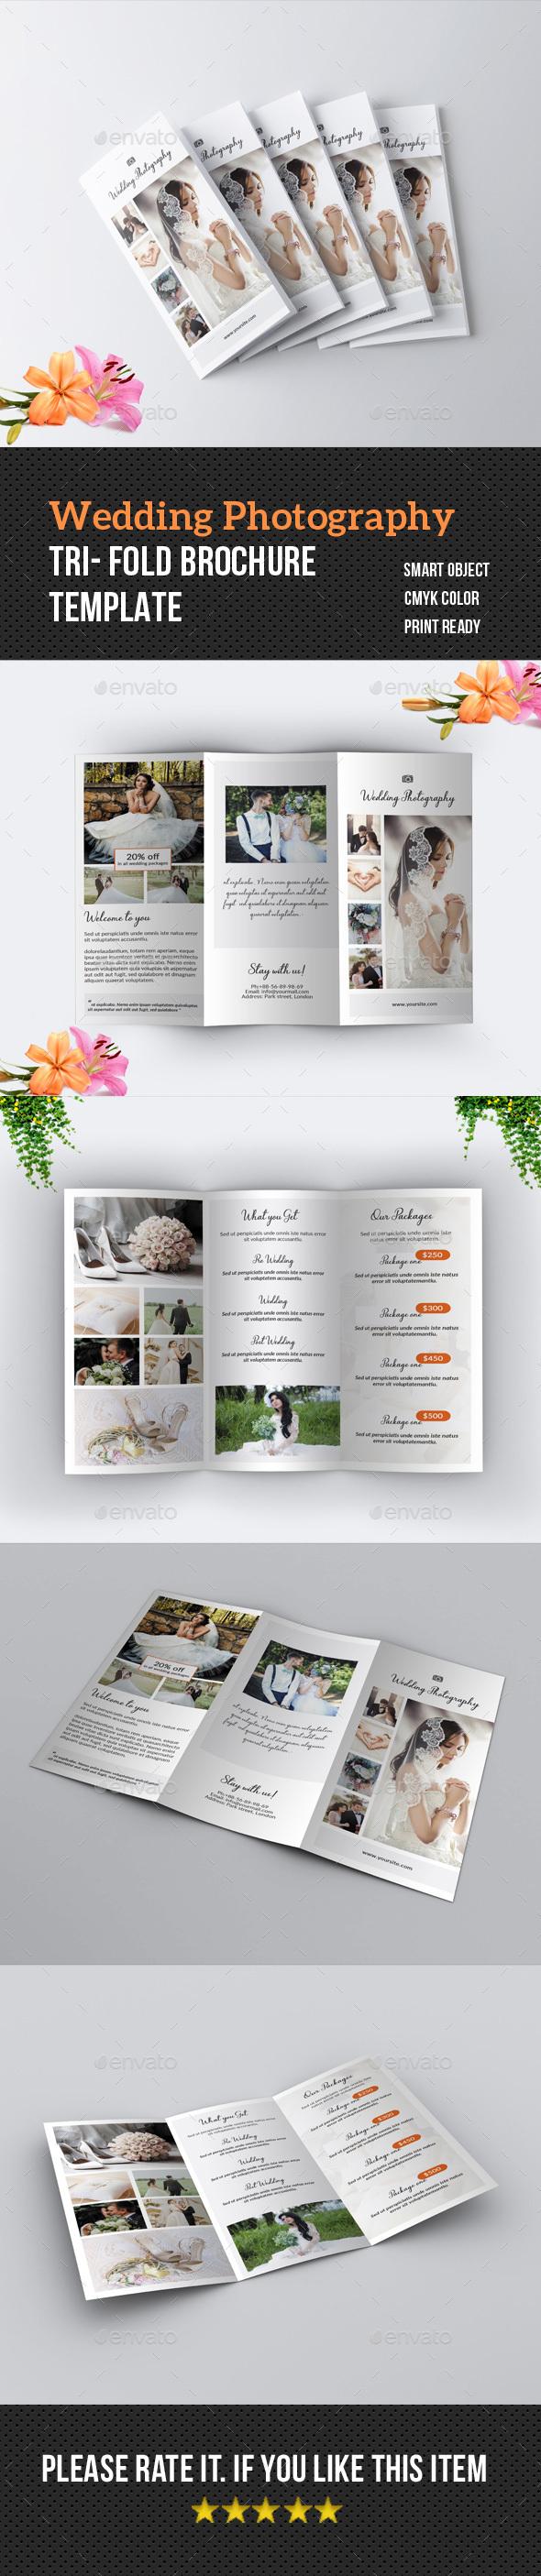 Wedding Photography Tri-Fold Brochure - Corporate Brochures